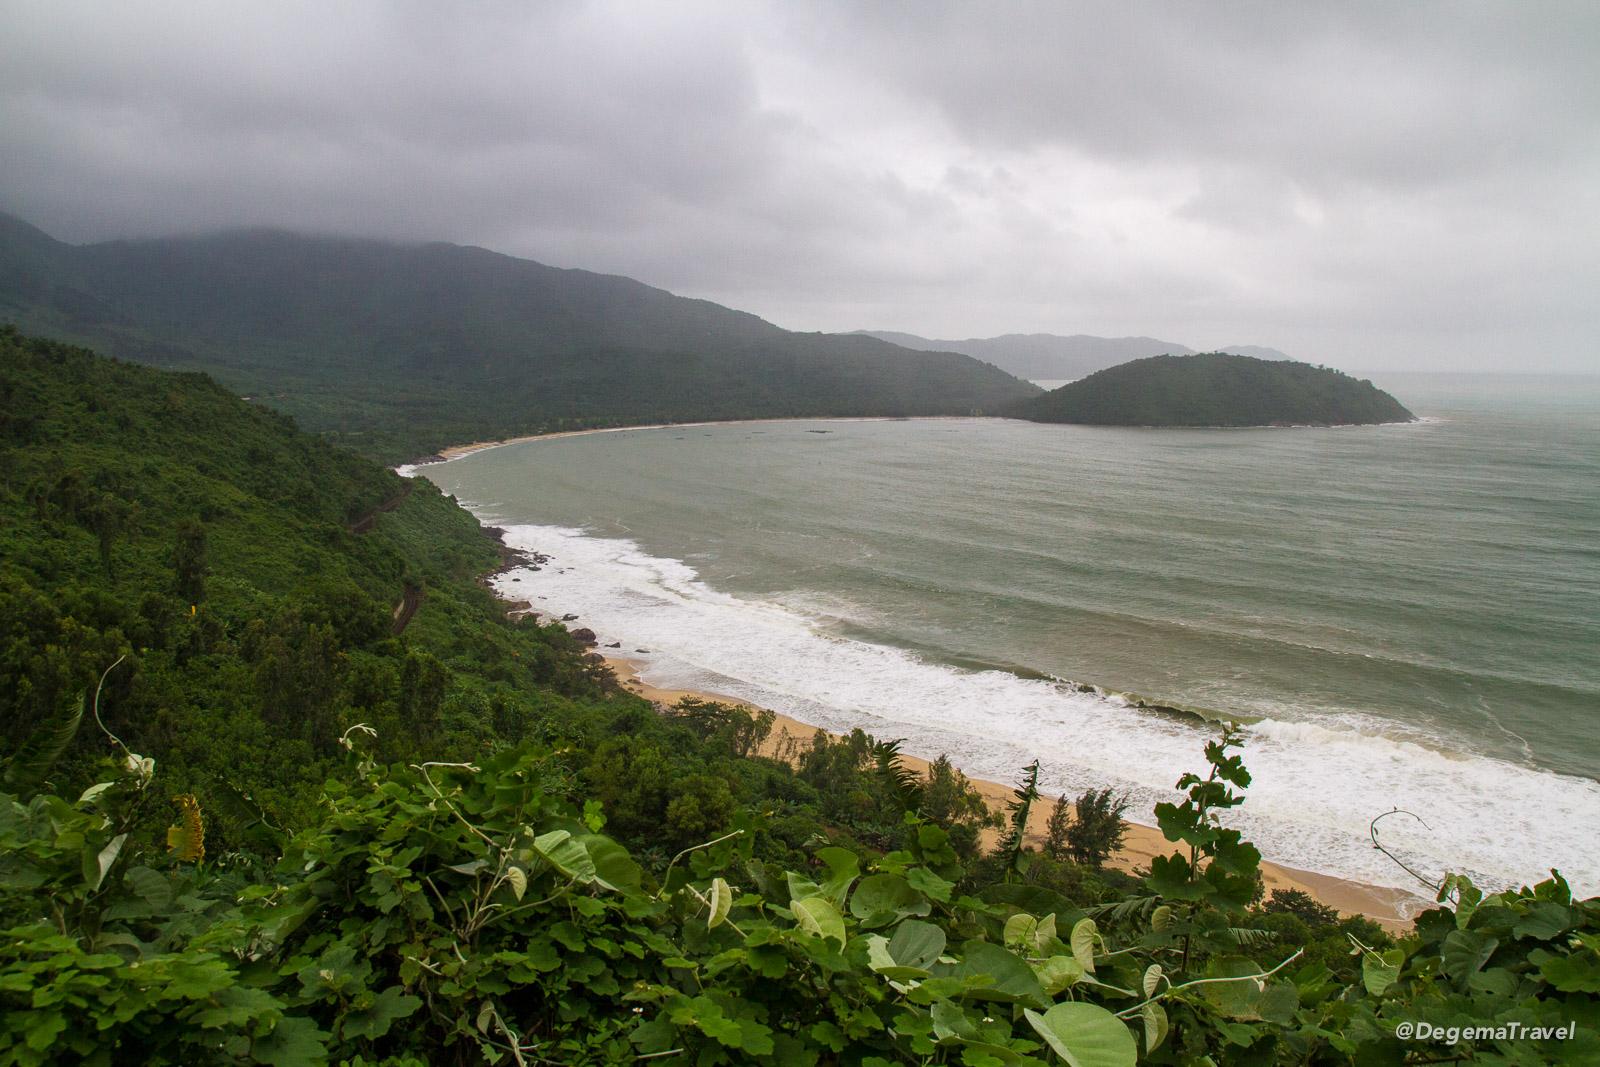 Làng Vân Beach near Da Nang, Vietnam